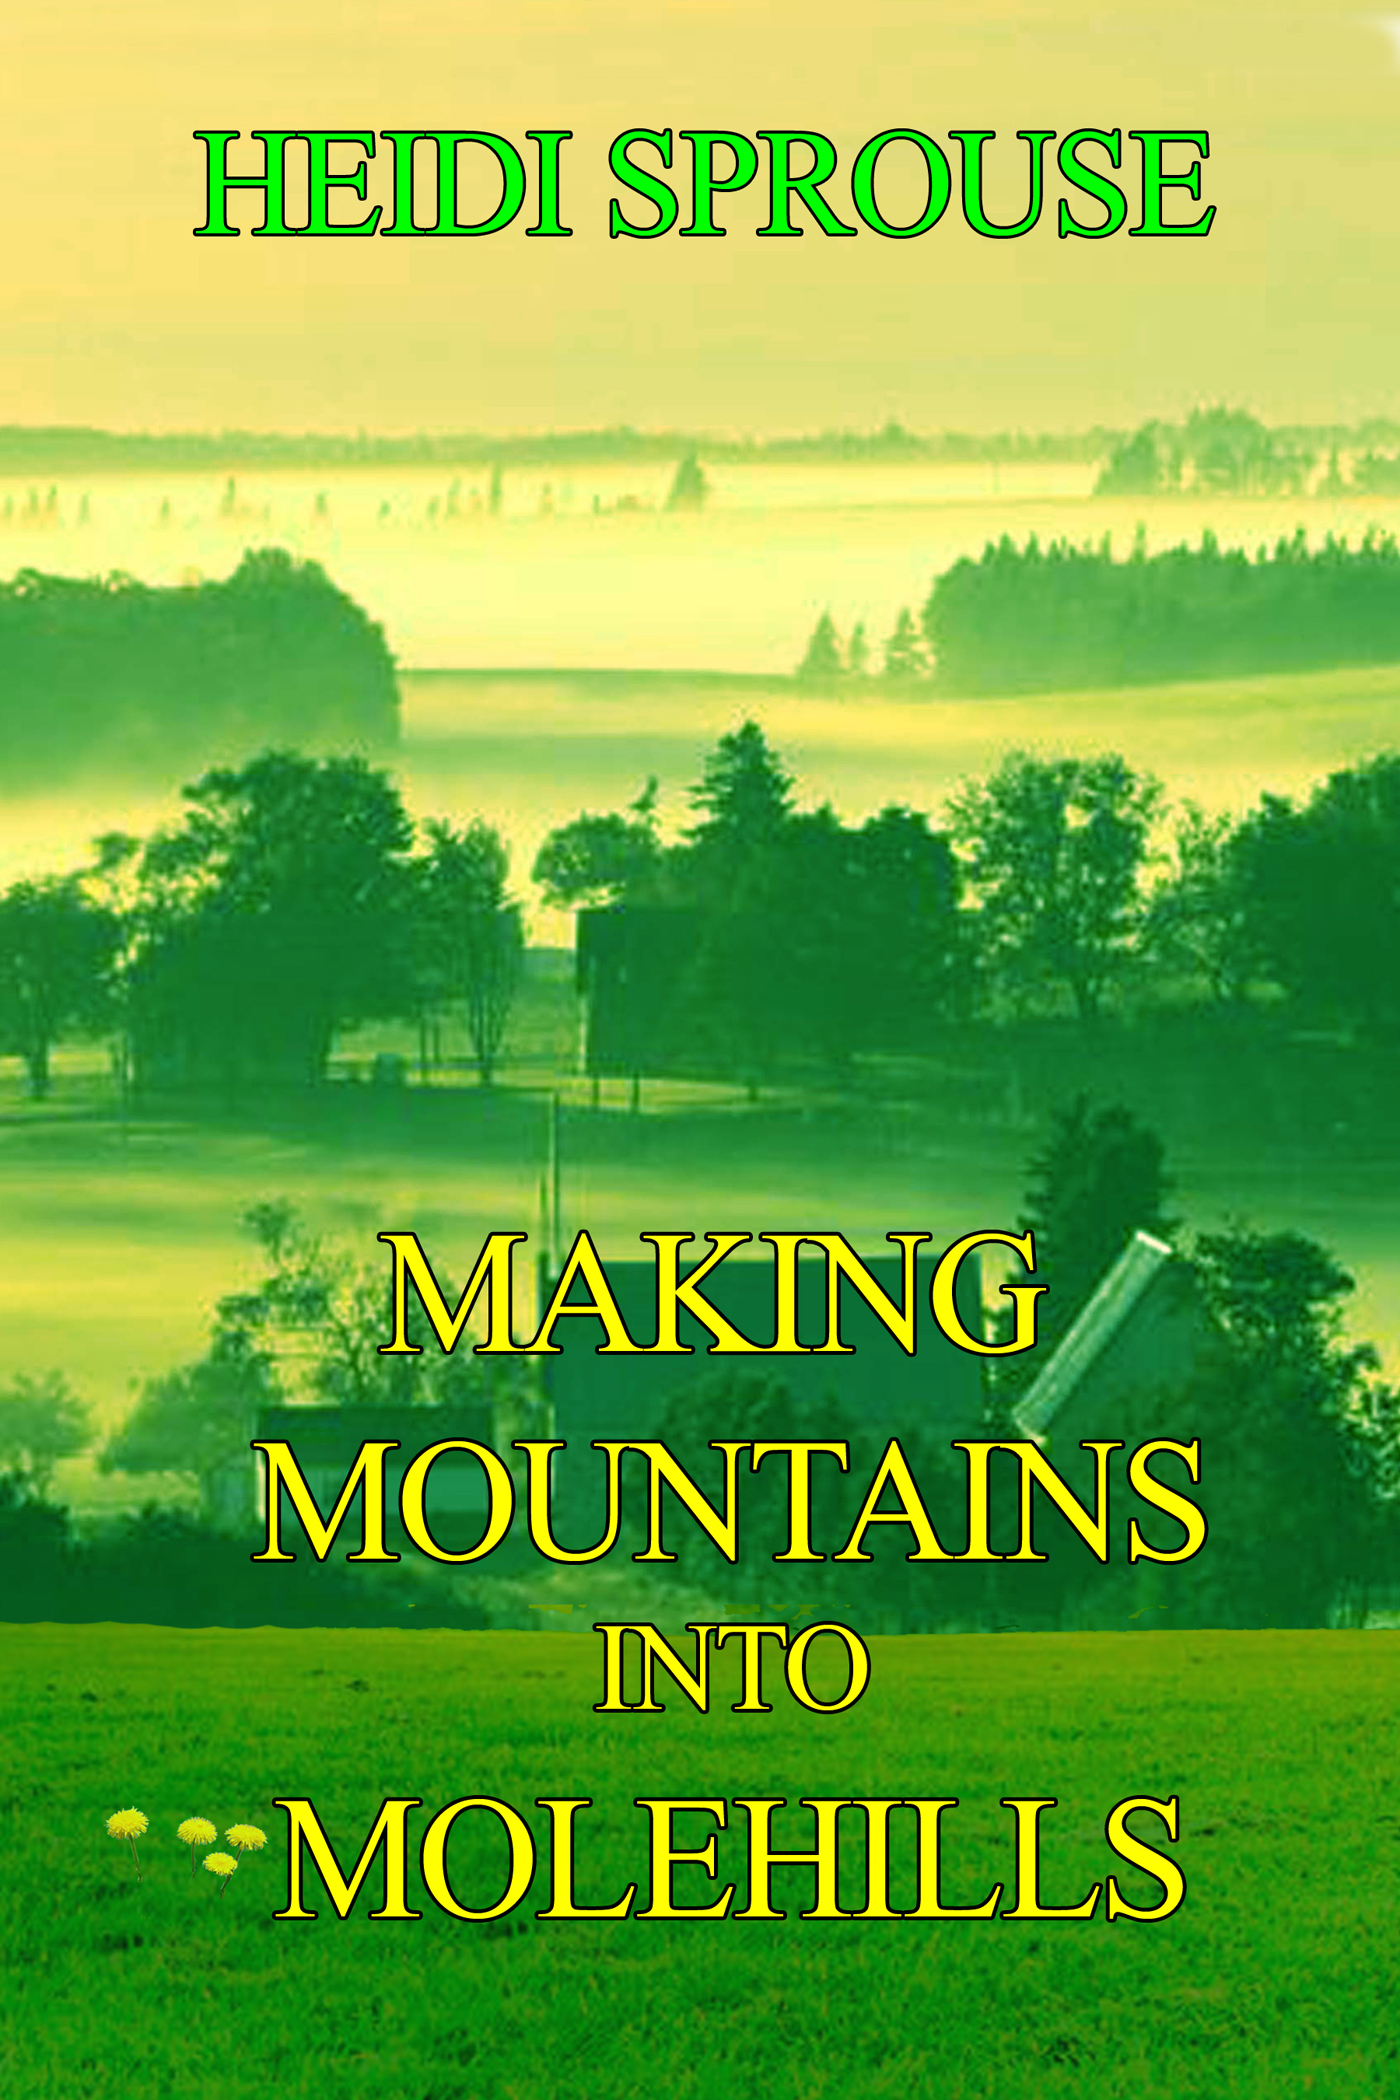 Making Mountains into Molehills 2